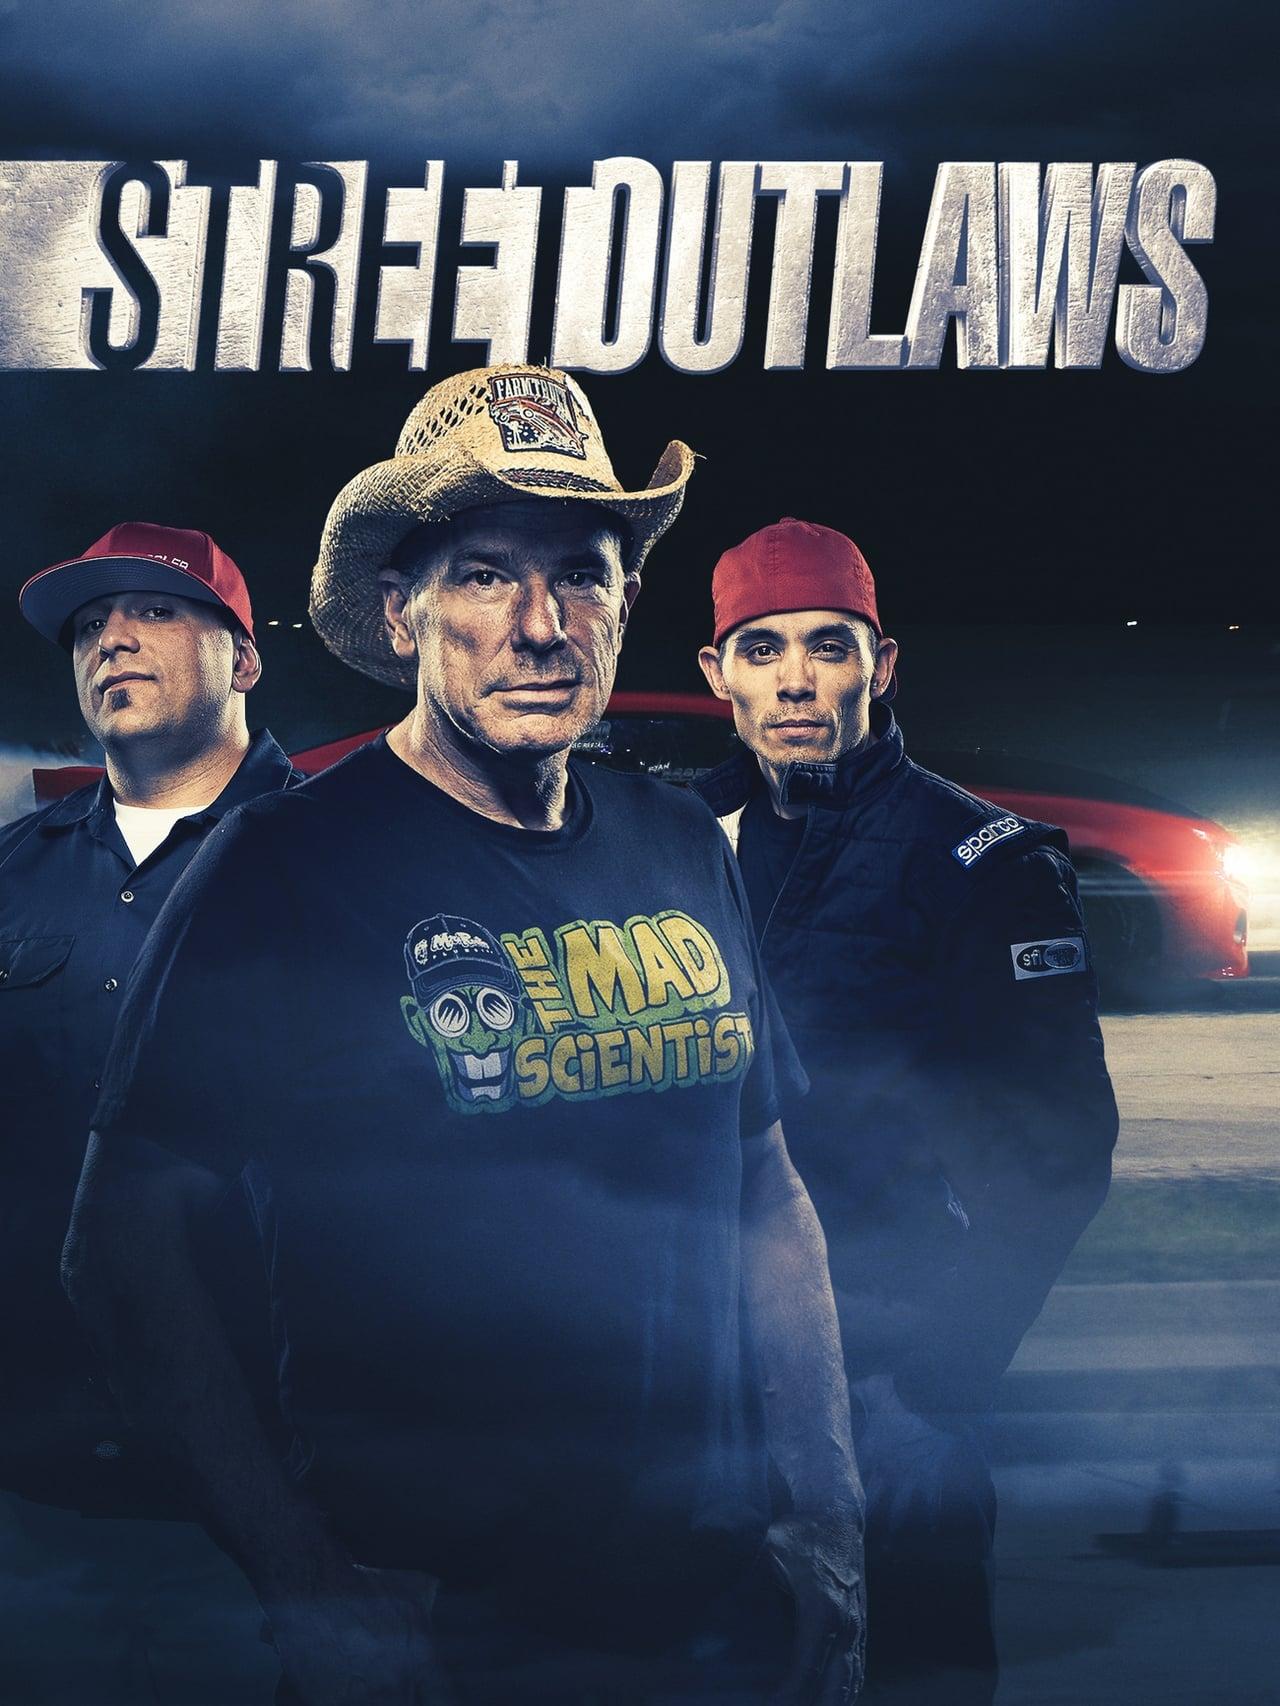 Putlocker Street Outlaws Season 11 (2018)